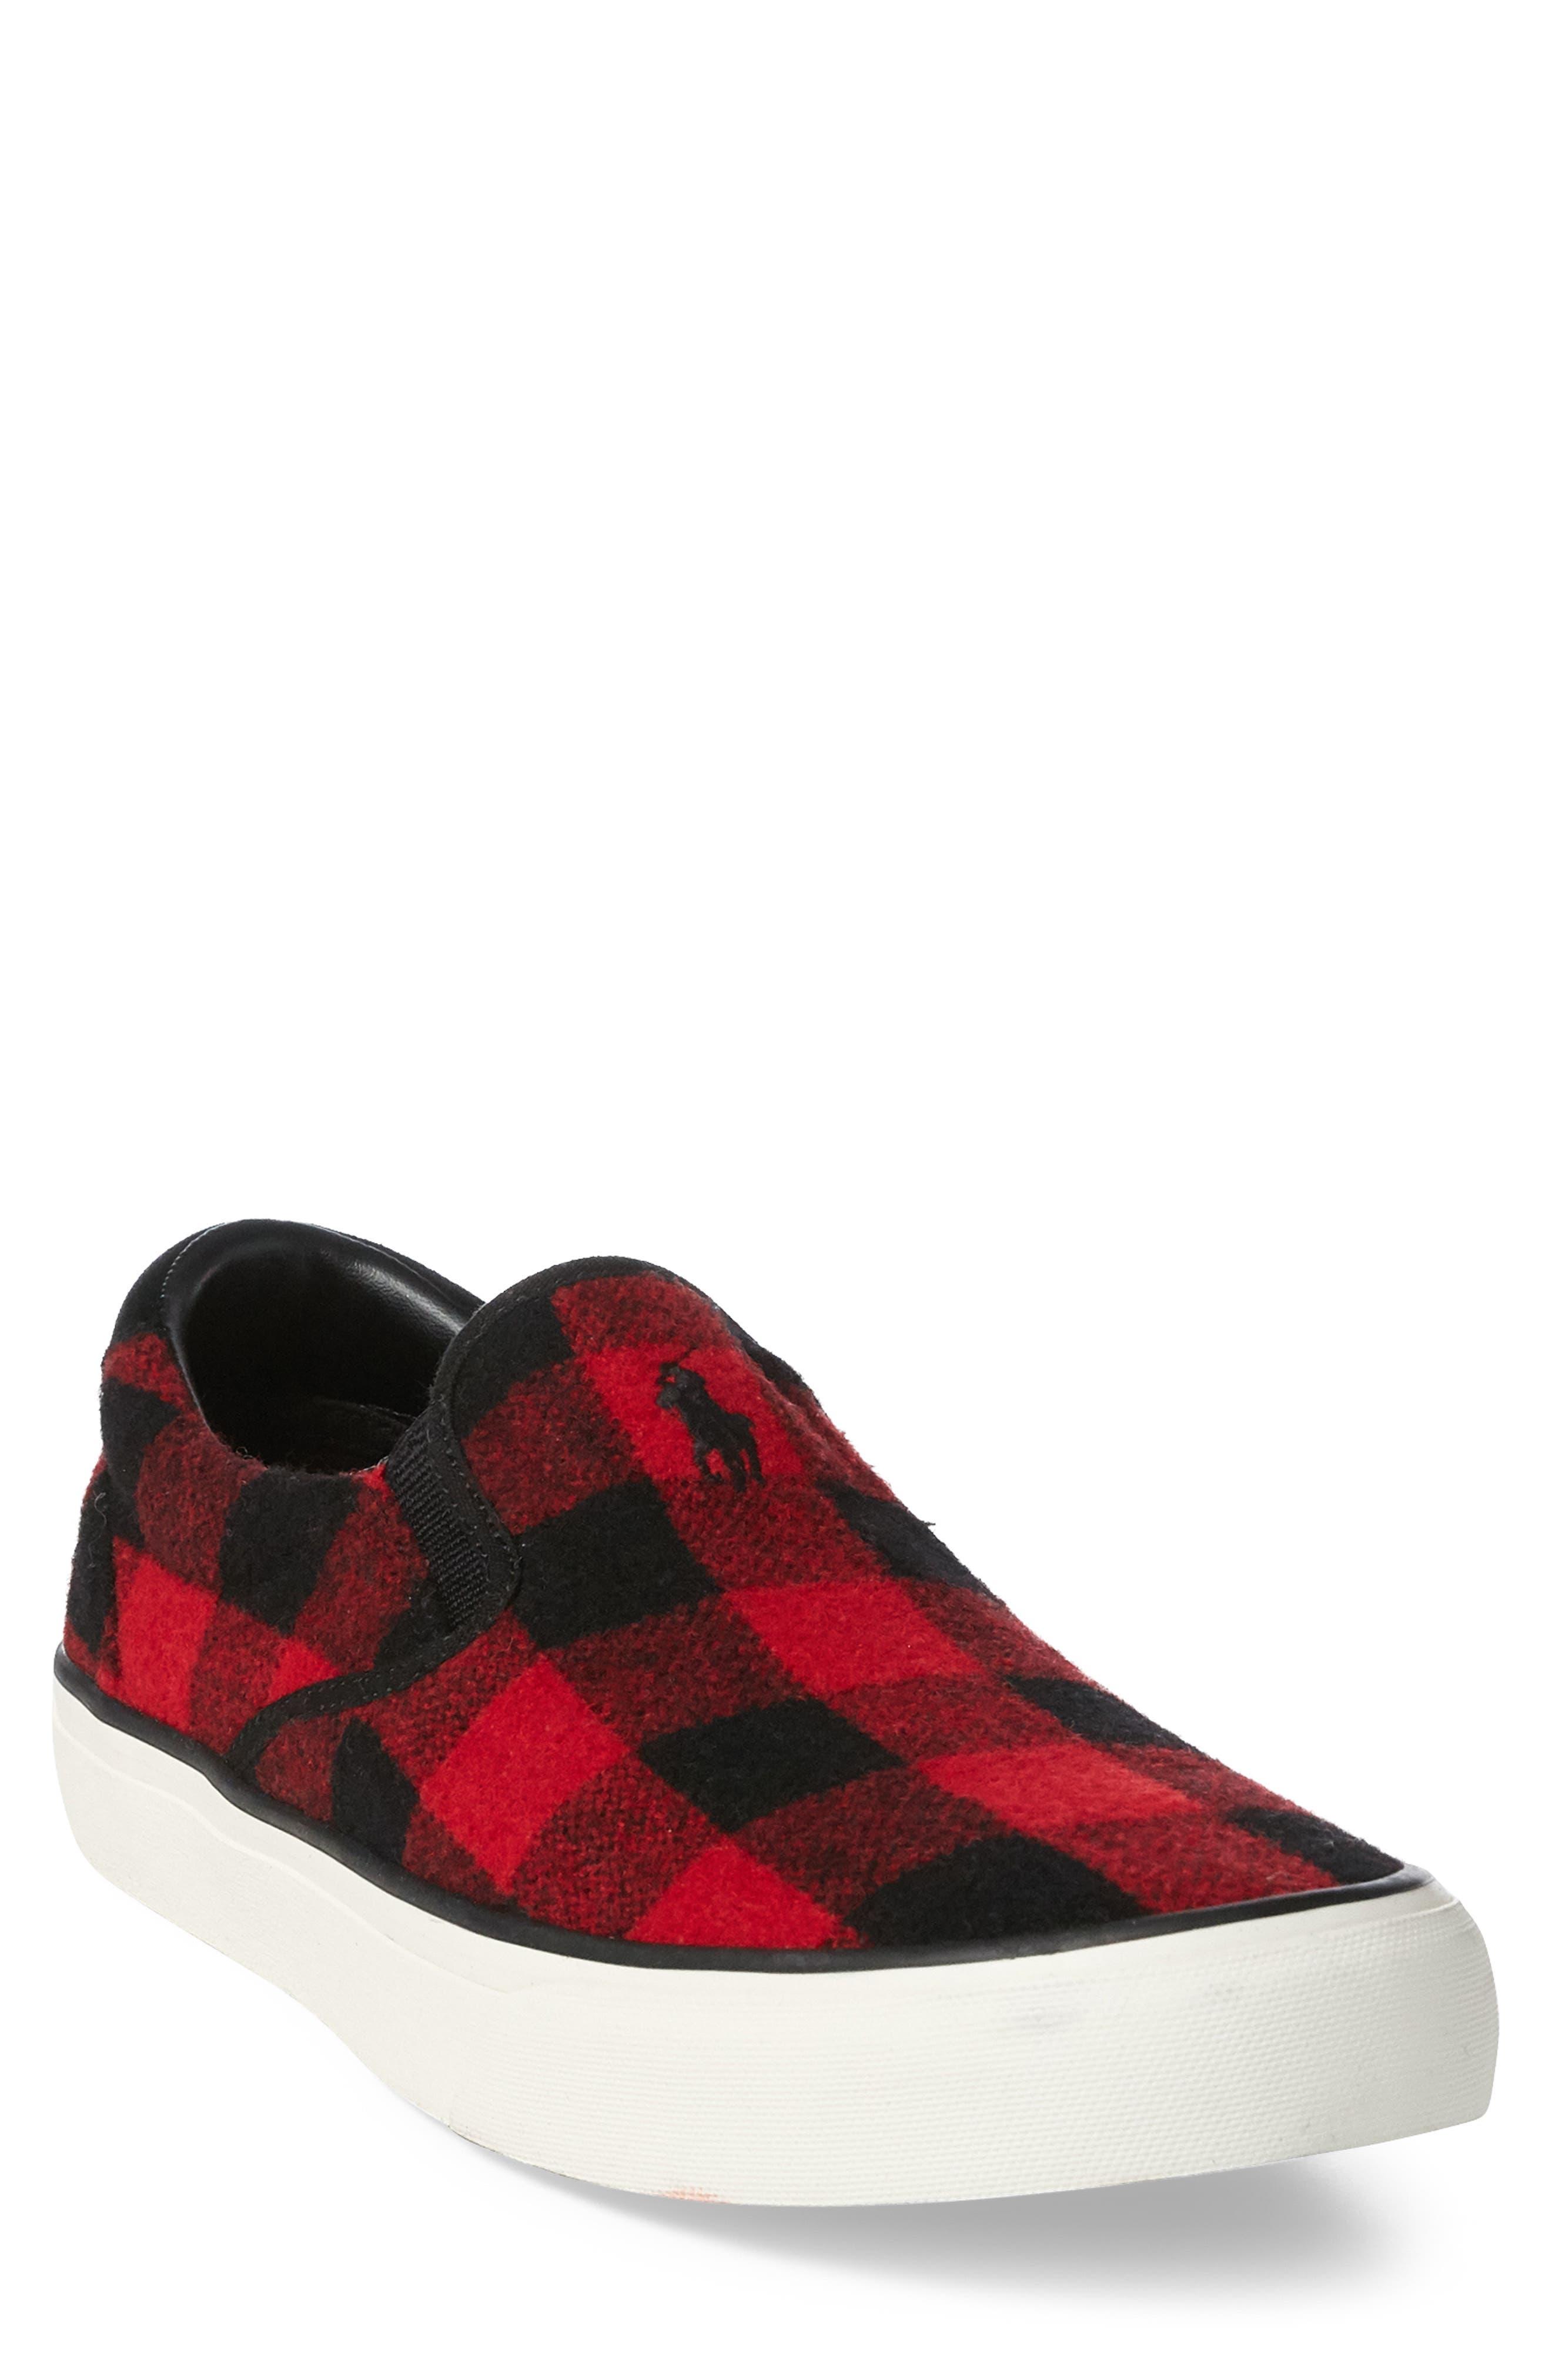 Thompson Wool Slip-On Sneaker,                             Main thumbnail 1, color,                             BLACK / RED